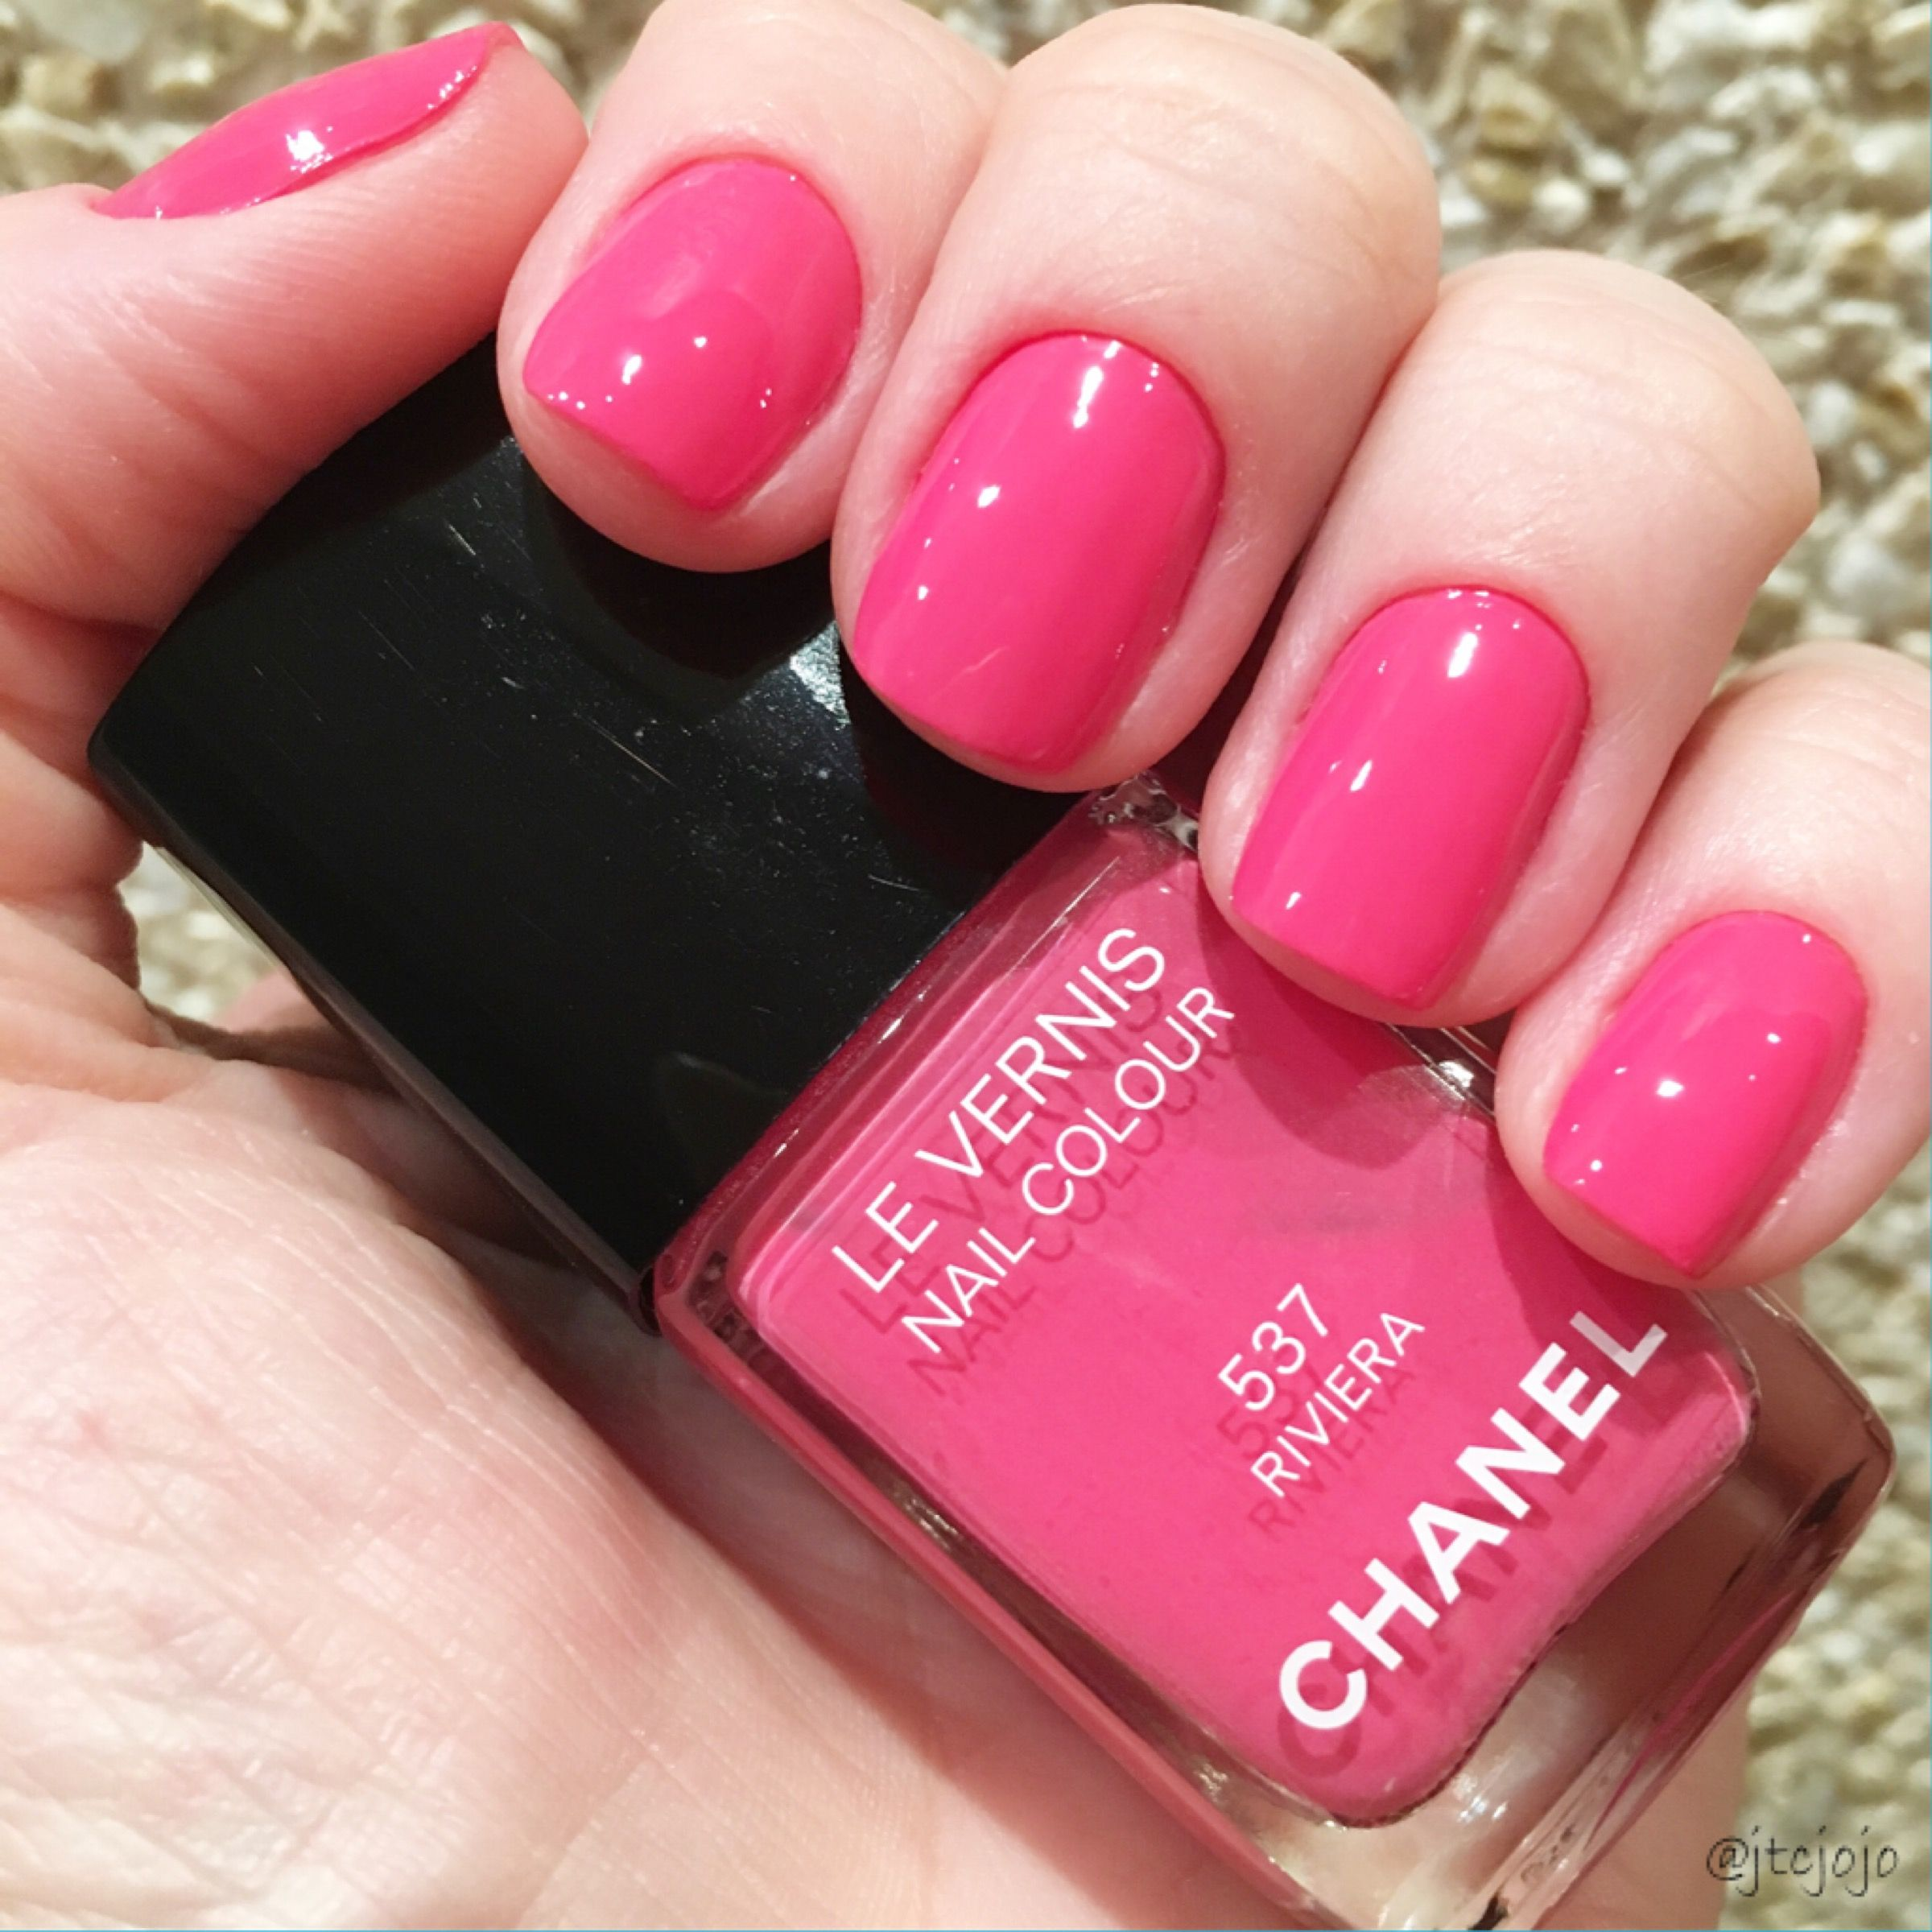 riviera 537 chanel nail polish collection pinterest nagellack. Black Bedroom Furniture Sets. Home Design Ideas